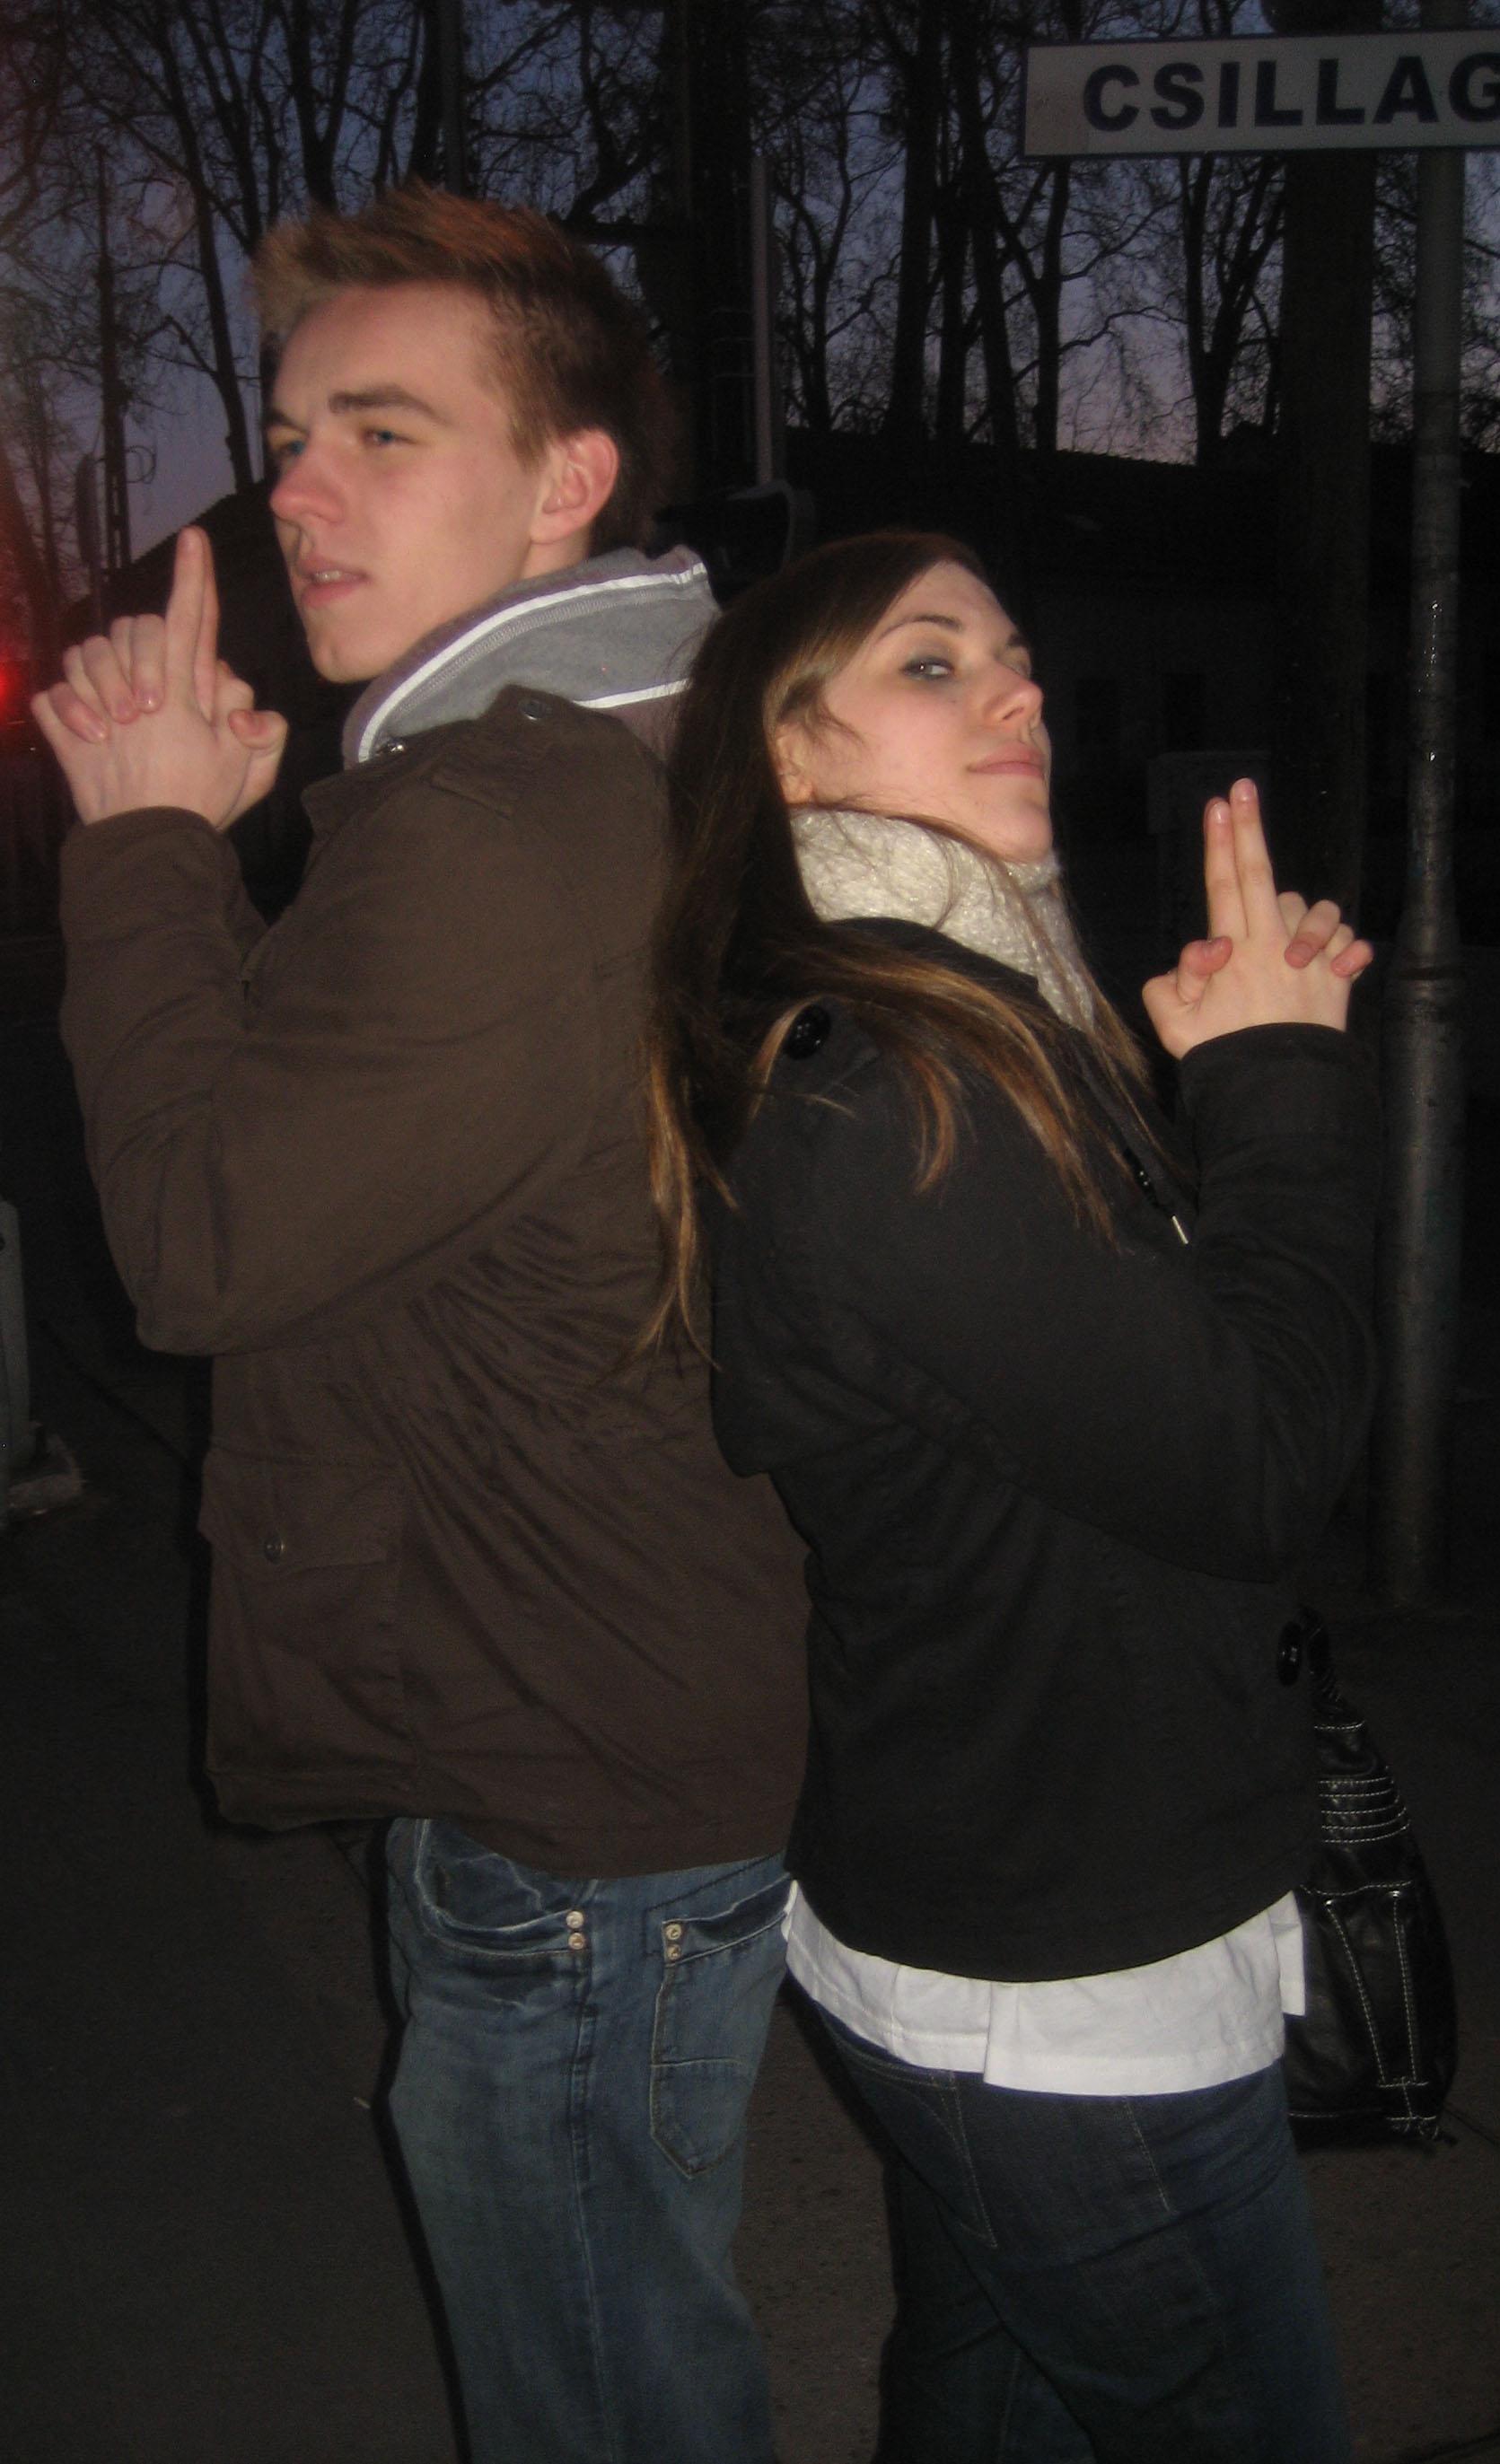 Mr. and Mrs. Smith alias Johannes und Lili